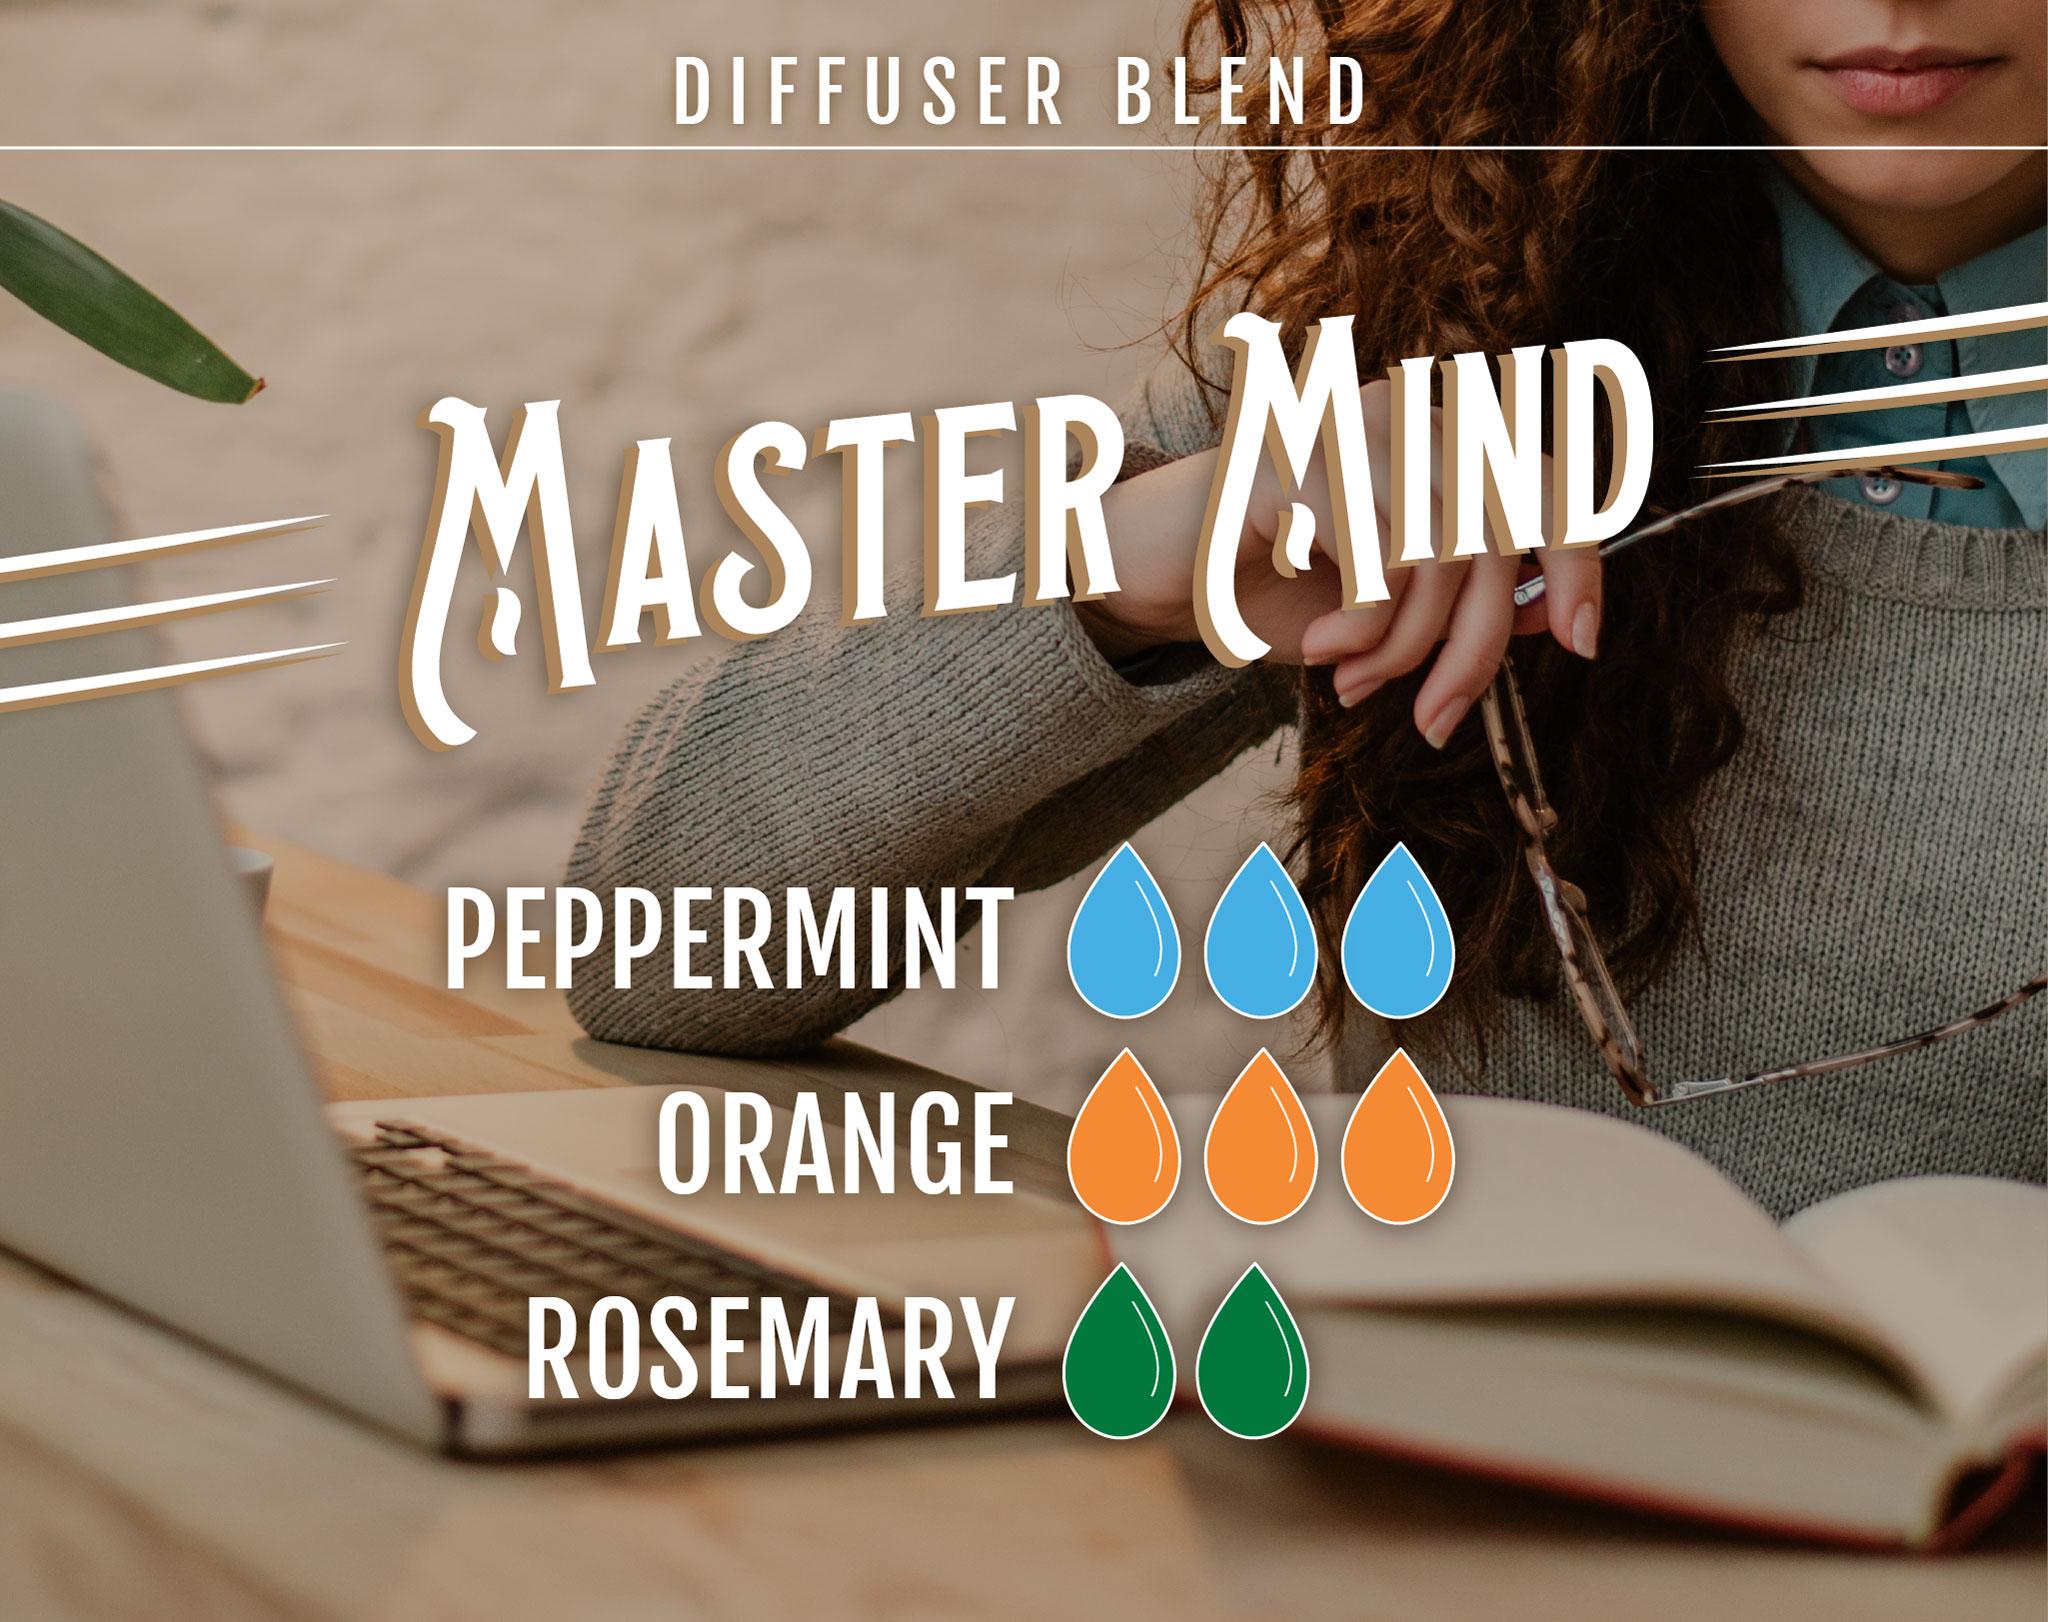 Master Mind Essential Oil (EO) Diffuser Blend: 3 drops Peppermint EO, 3 drops Orange EO, 2 drops Rosemary